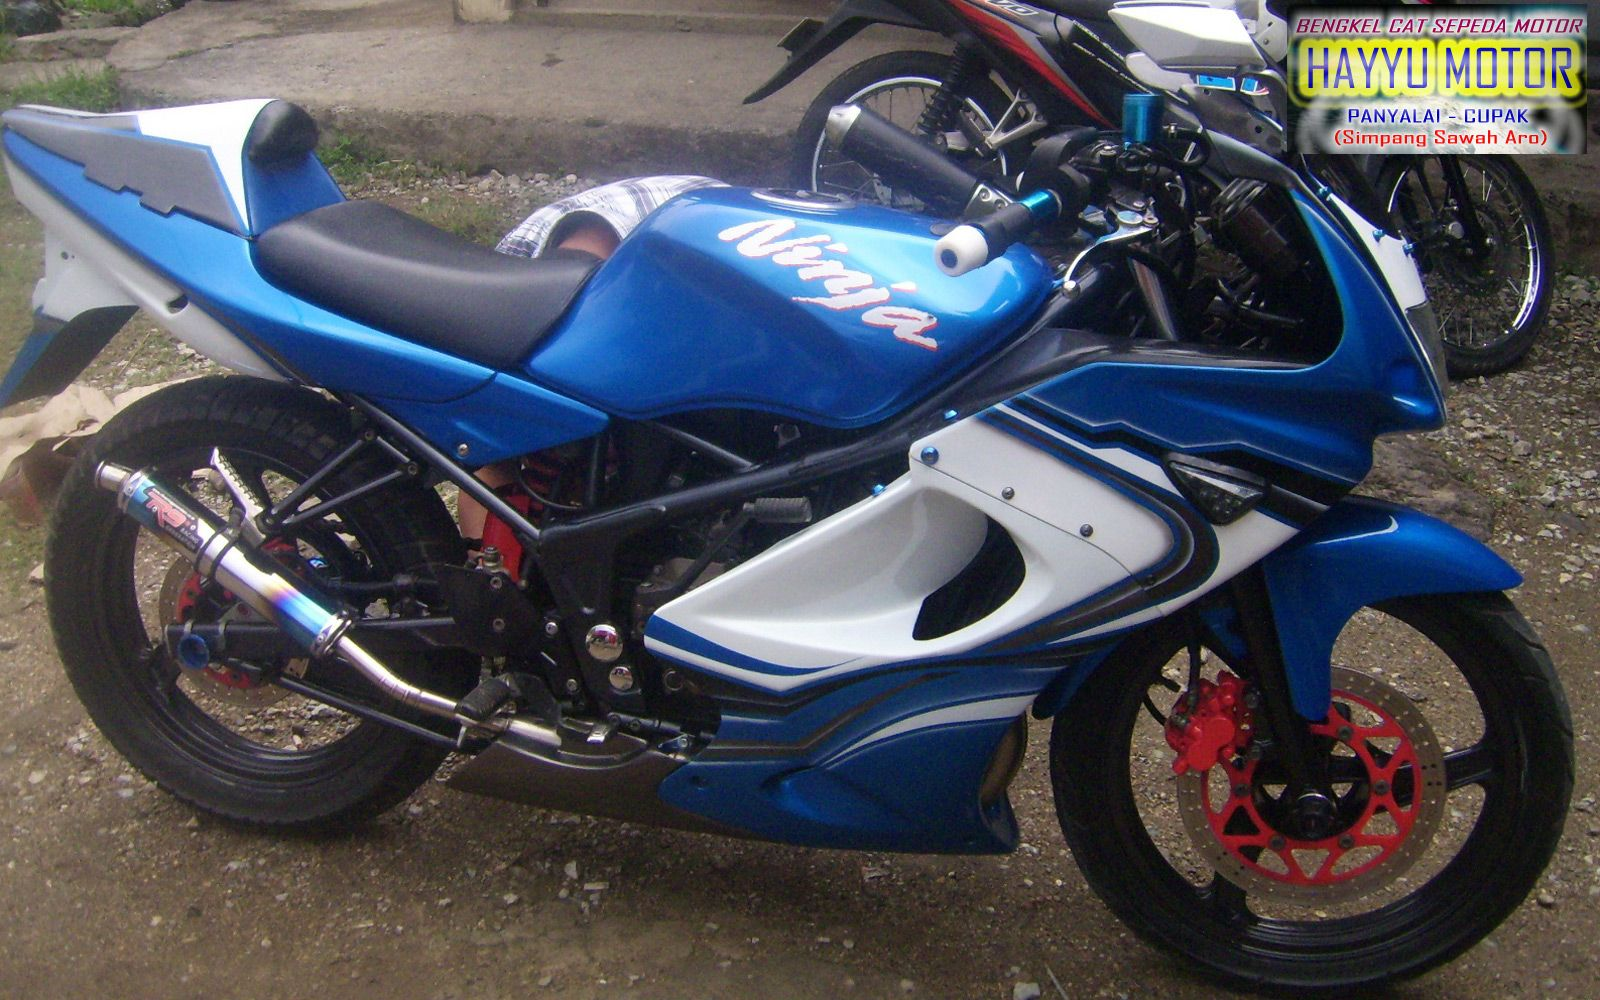 Kumpulan Modifikasi Motor Ninja R Warna Biru Terbaru